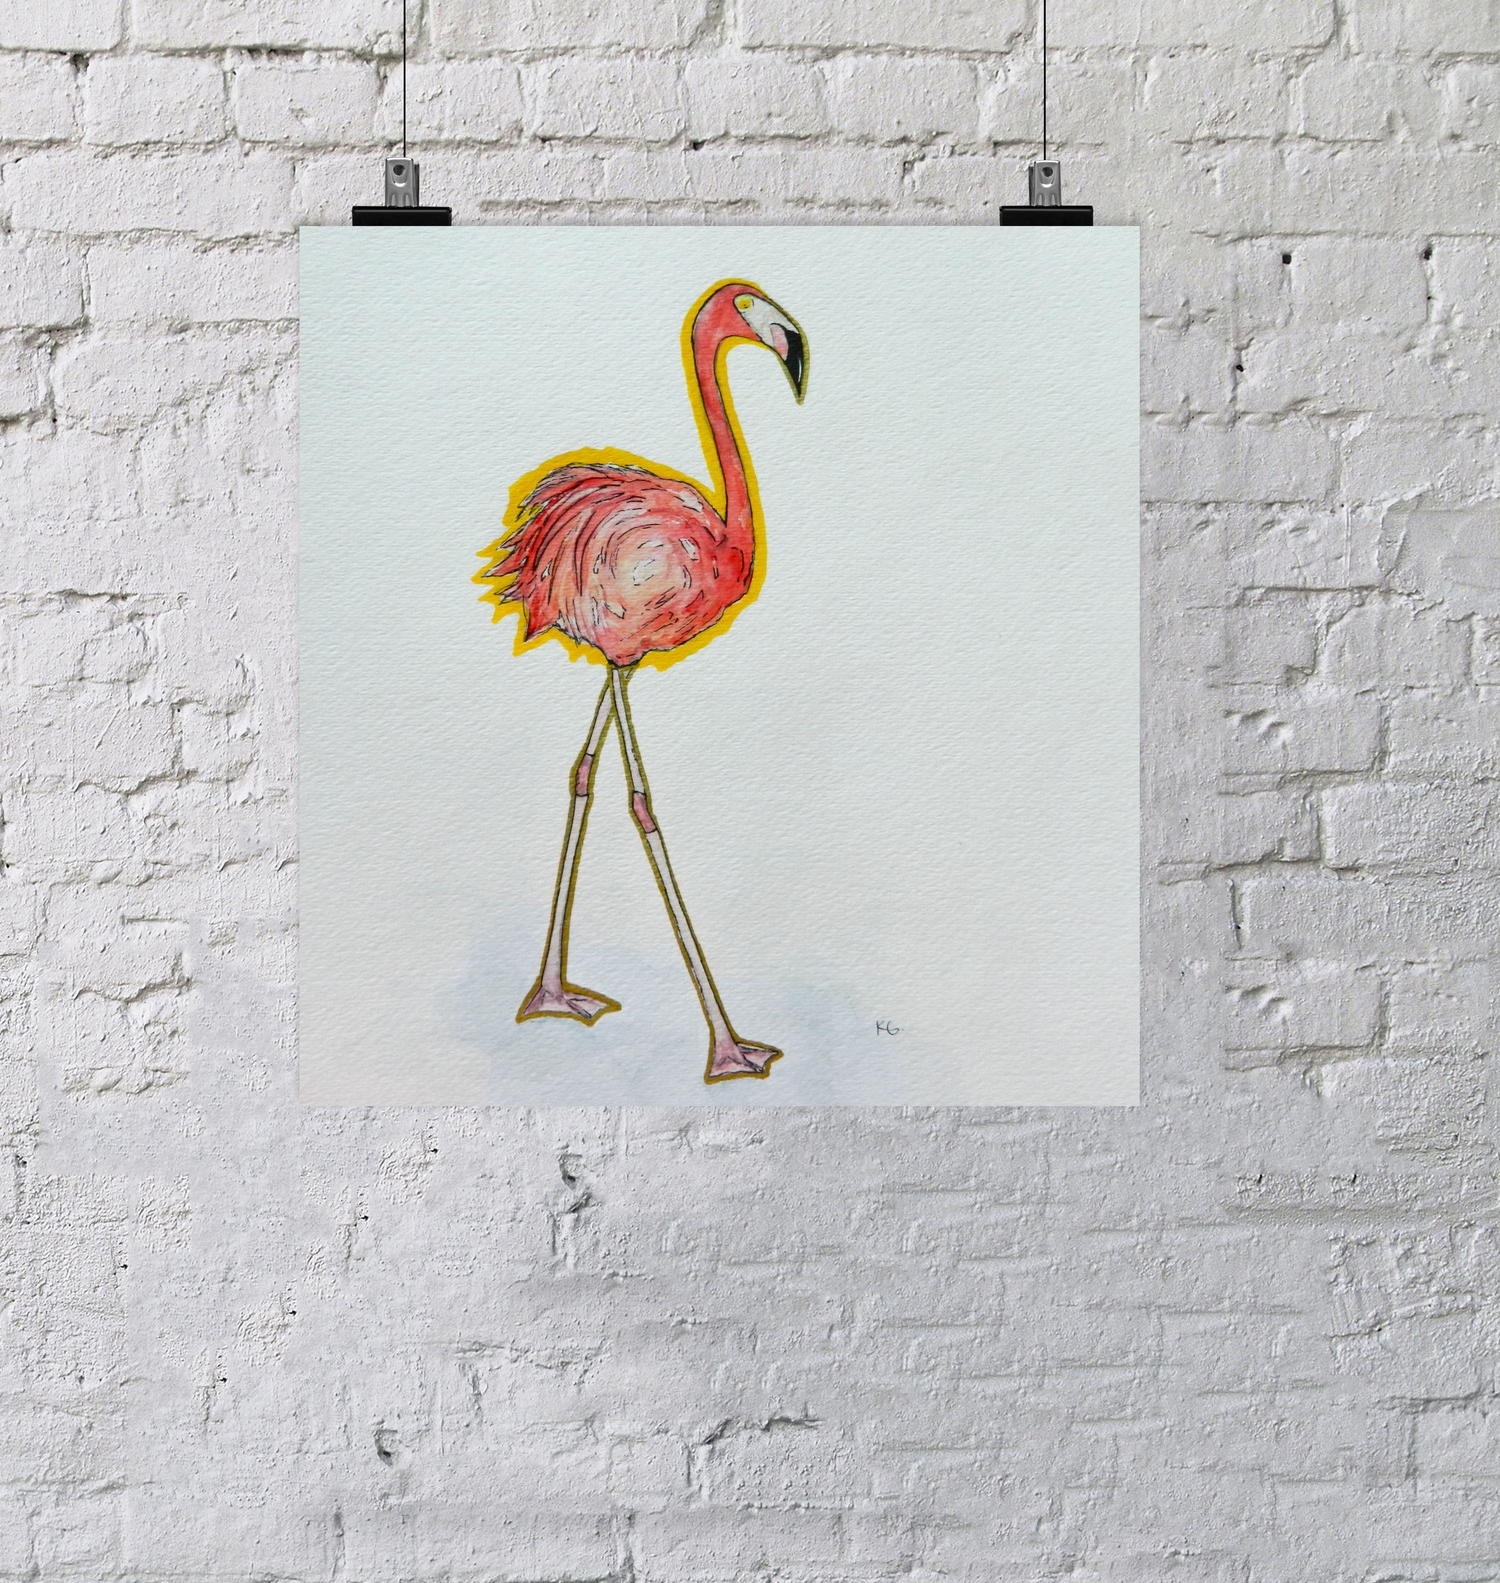 Flamingo on wall.jpg